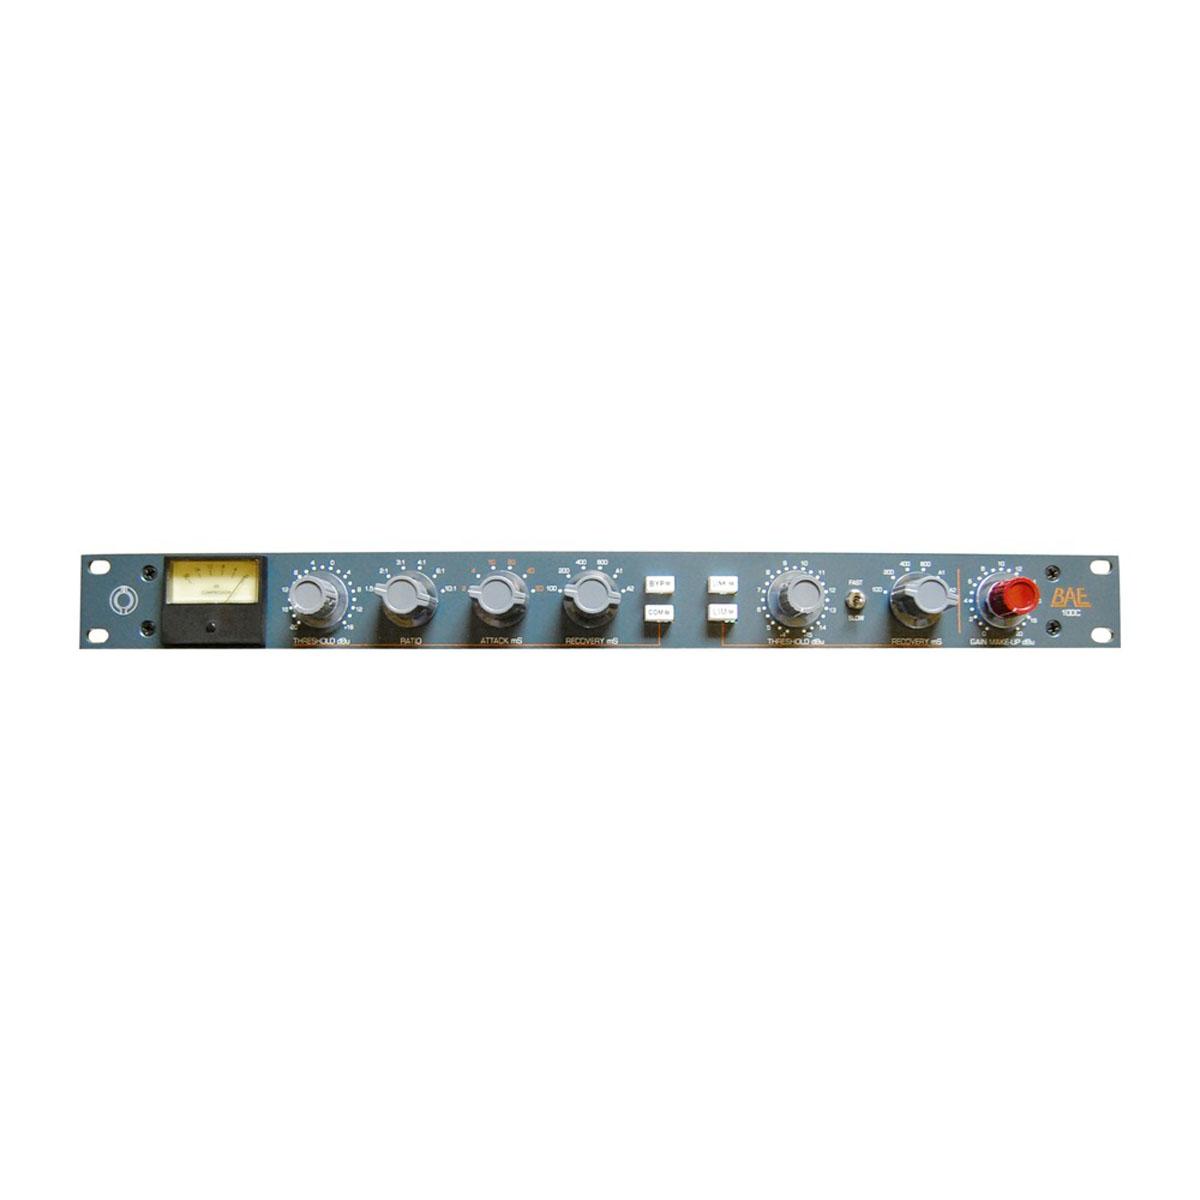 BAE 10DC Compressor/Limiter w/PSU (Discontinued) » Sonic Circus